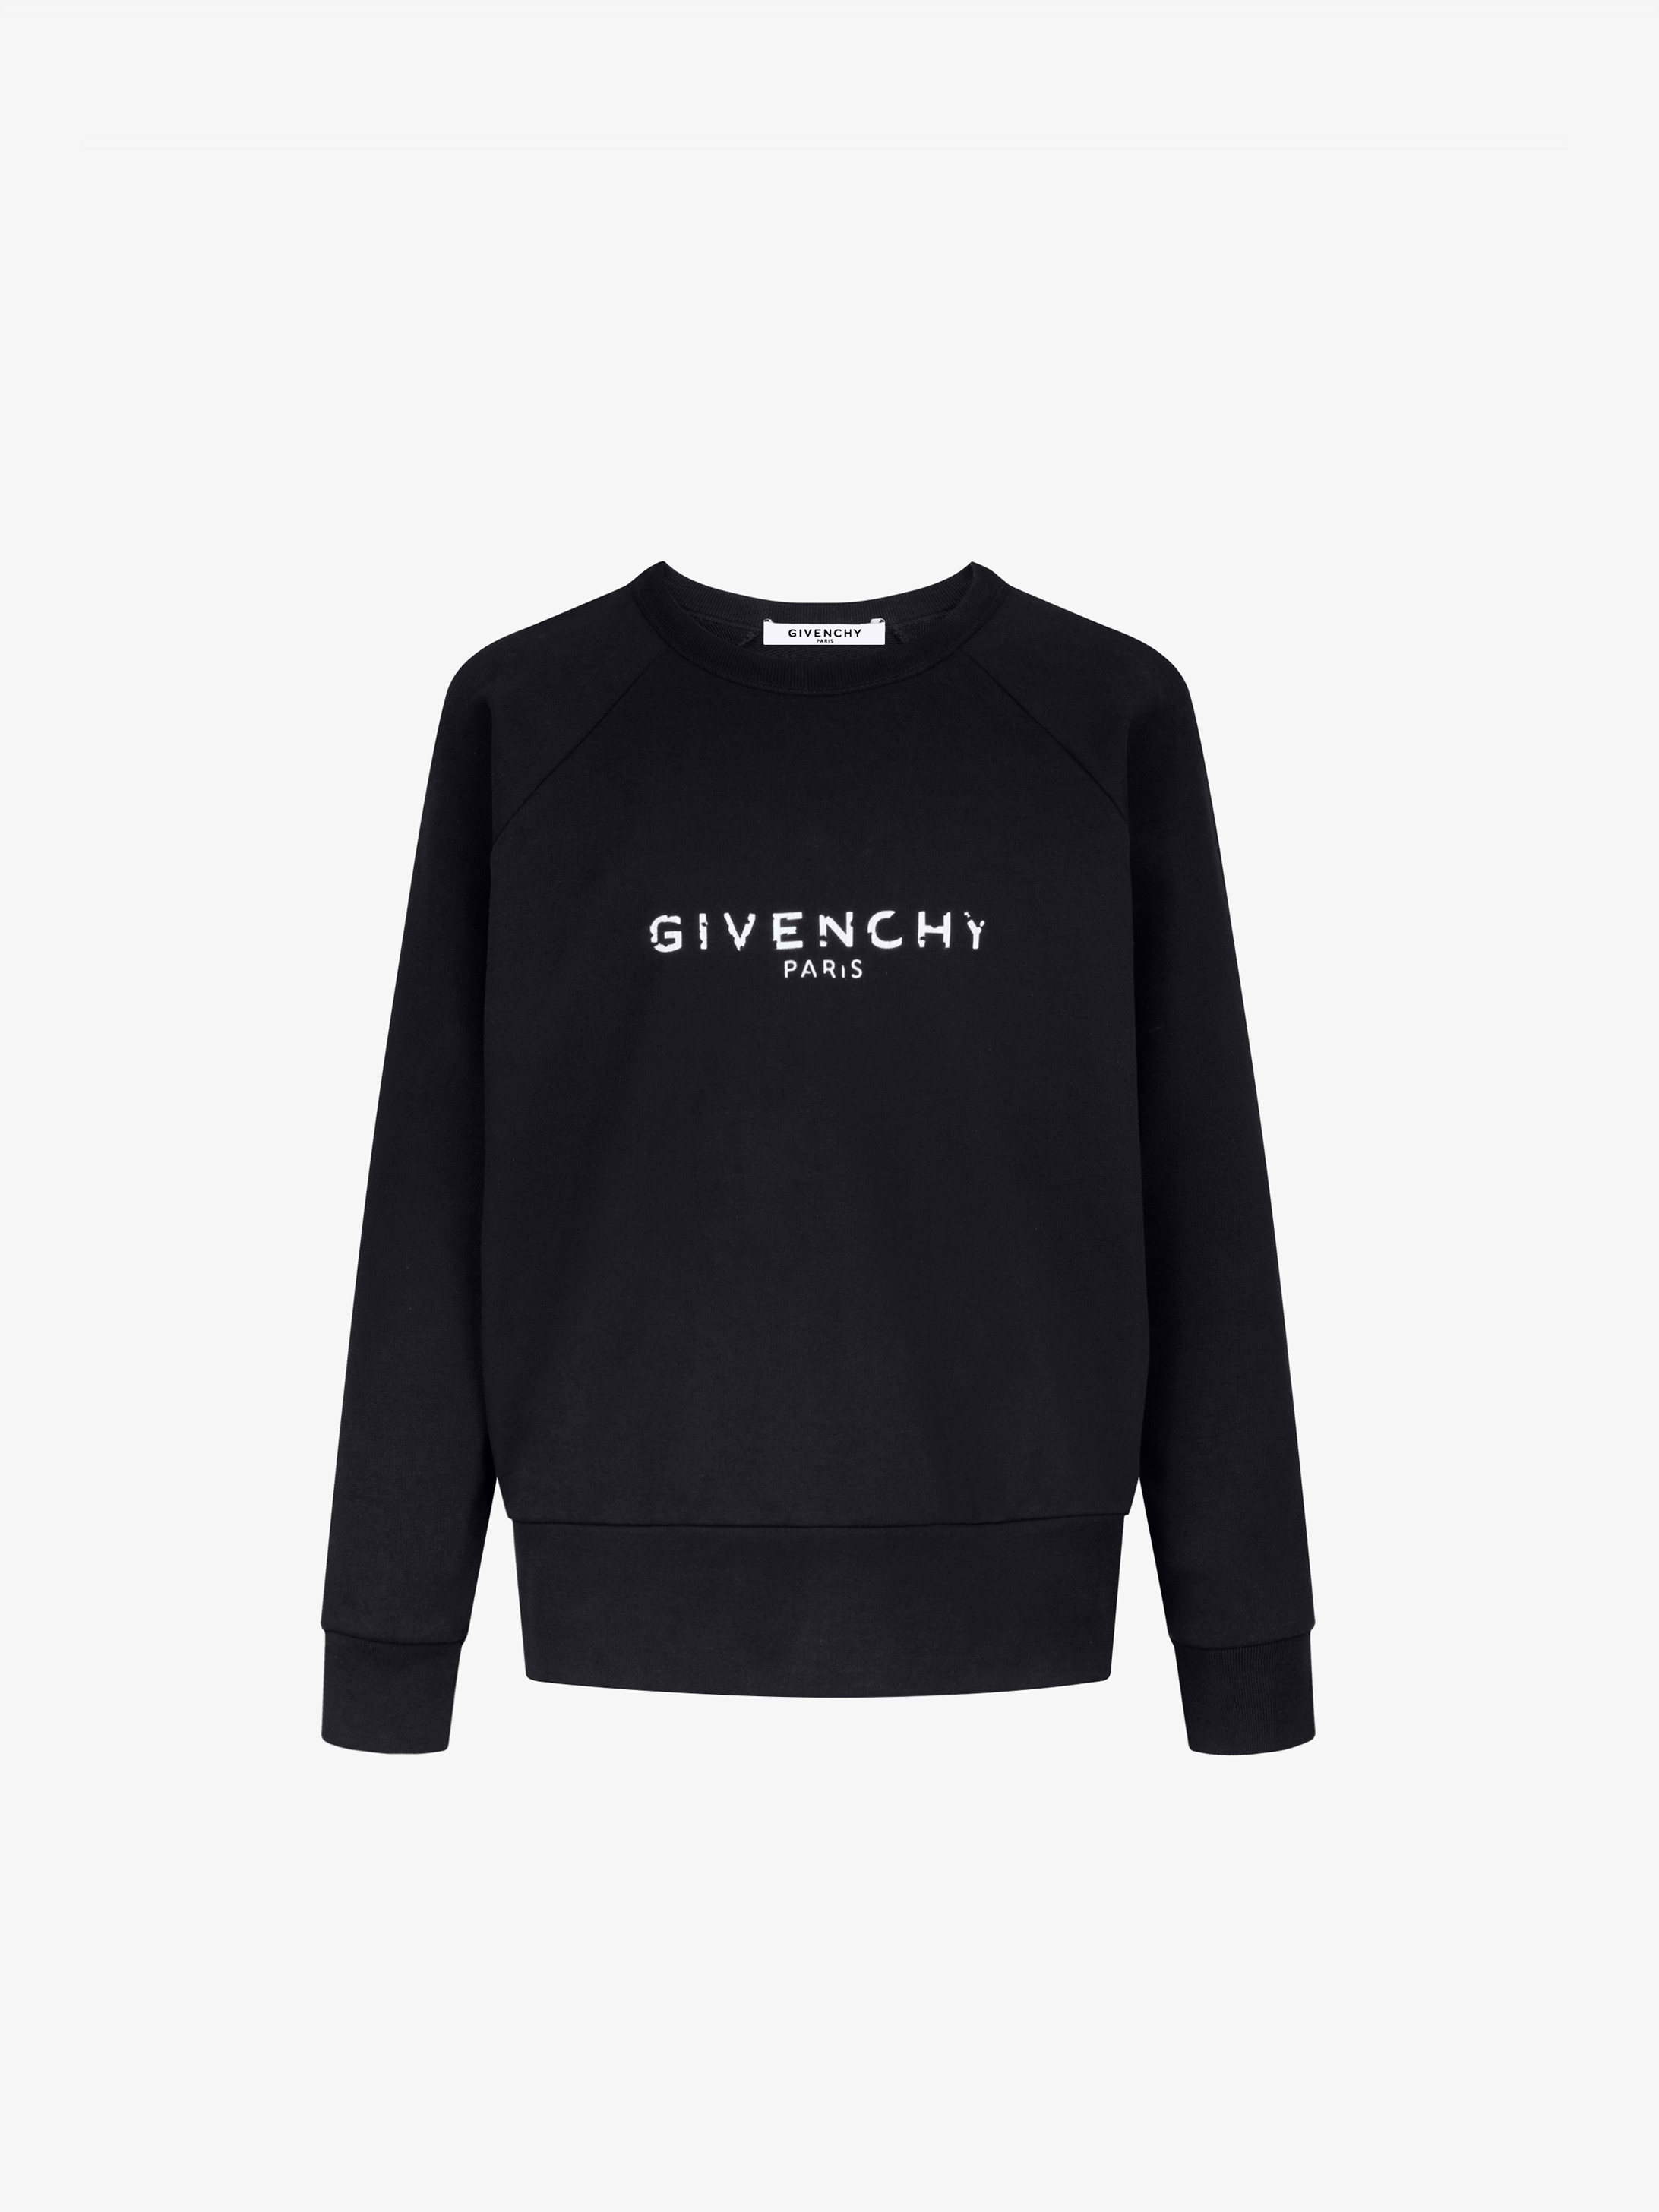 Blurred GIVENCHY PARIS sweatshirt  d2a4cd926b0c